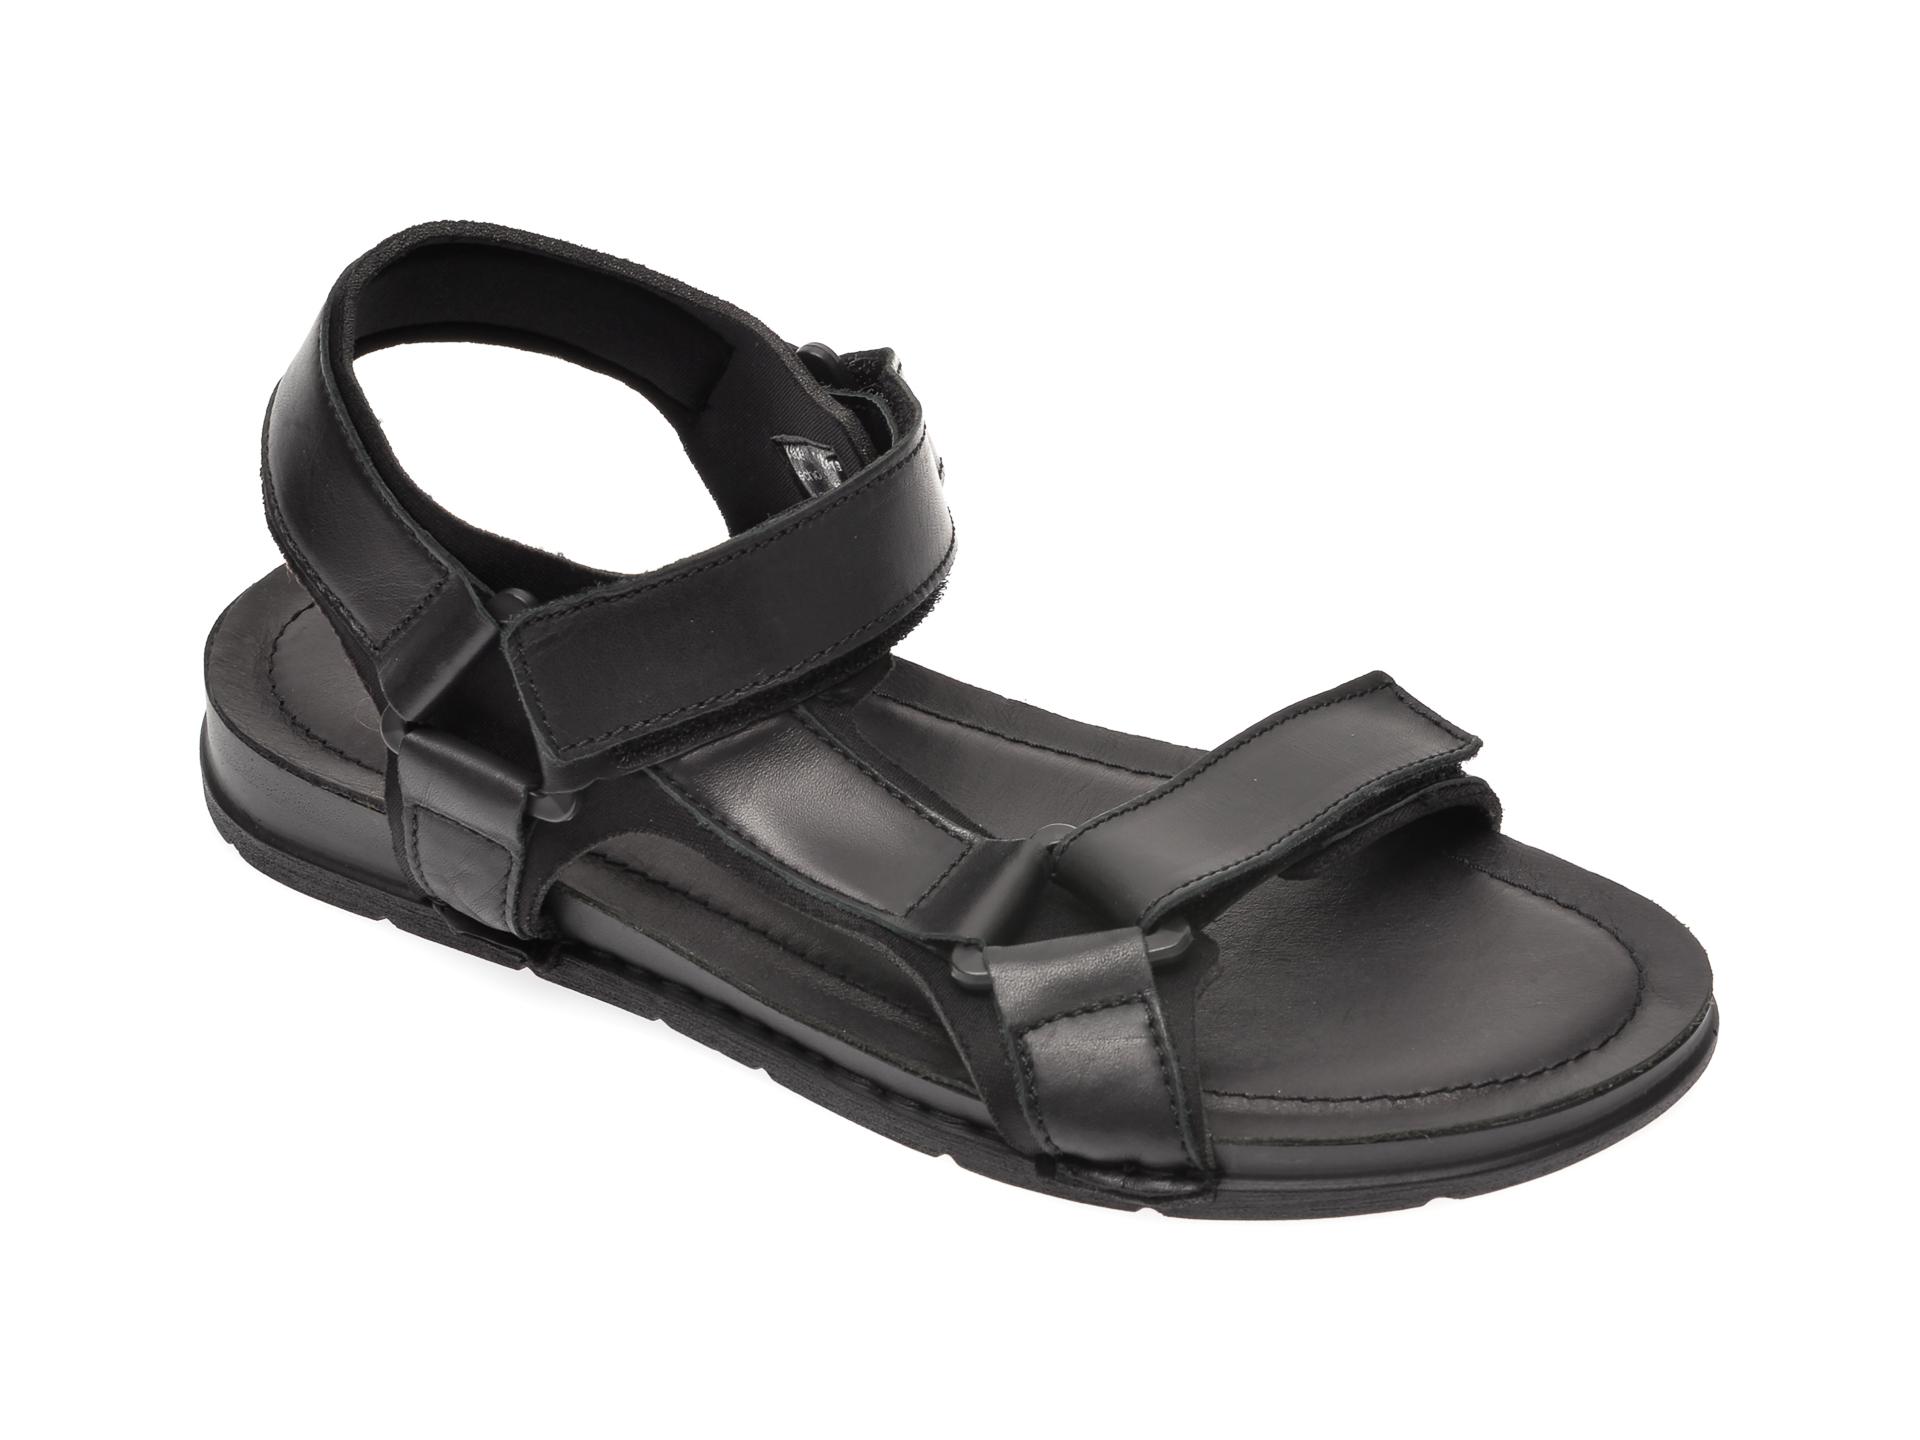 Sandale ALDO negre, Uligolian001, din piele naturala imagine